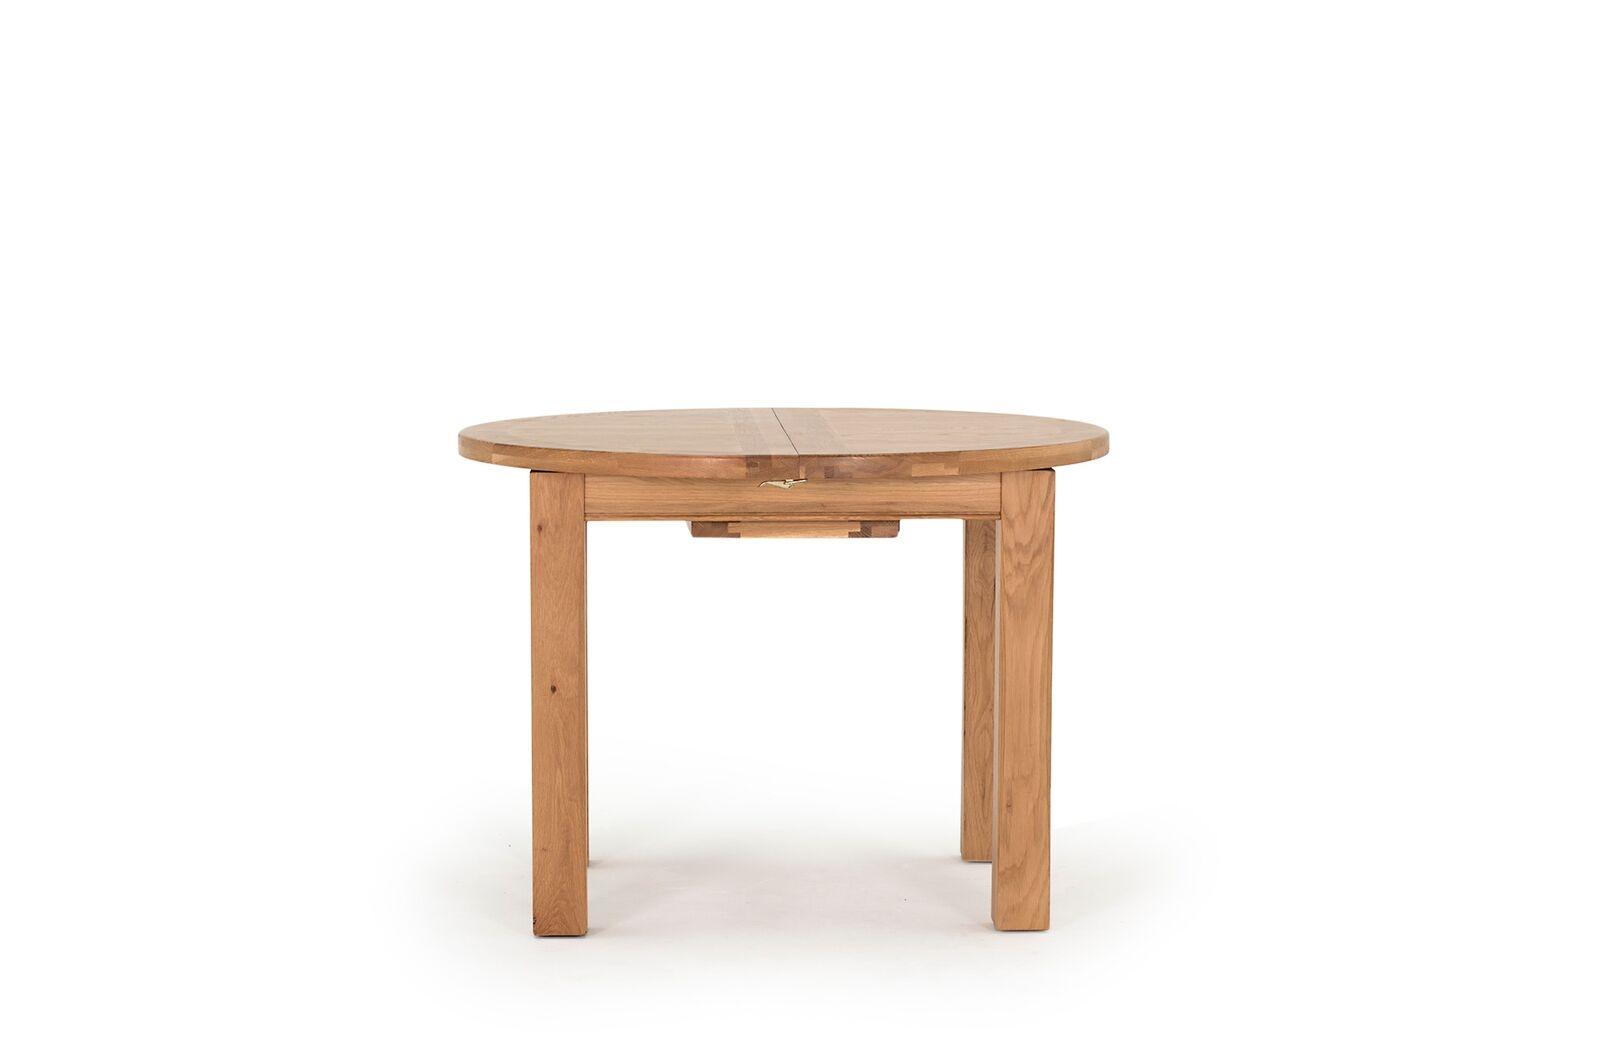 Masa extensibila din lemn de stejar si furnir Breeze Round Oak L107-140xl107xH78 cm